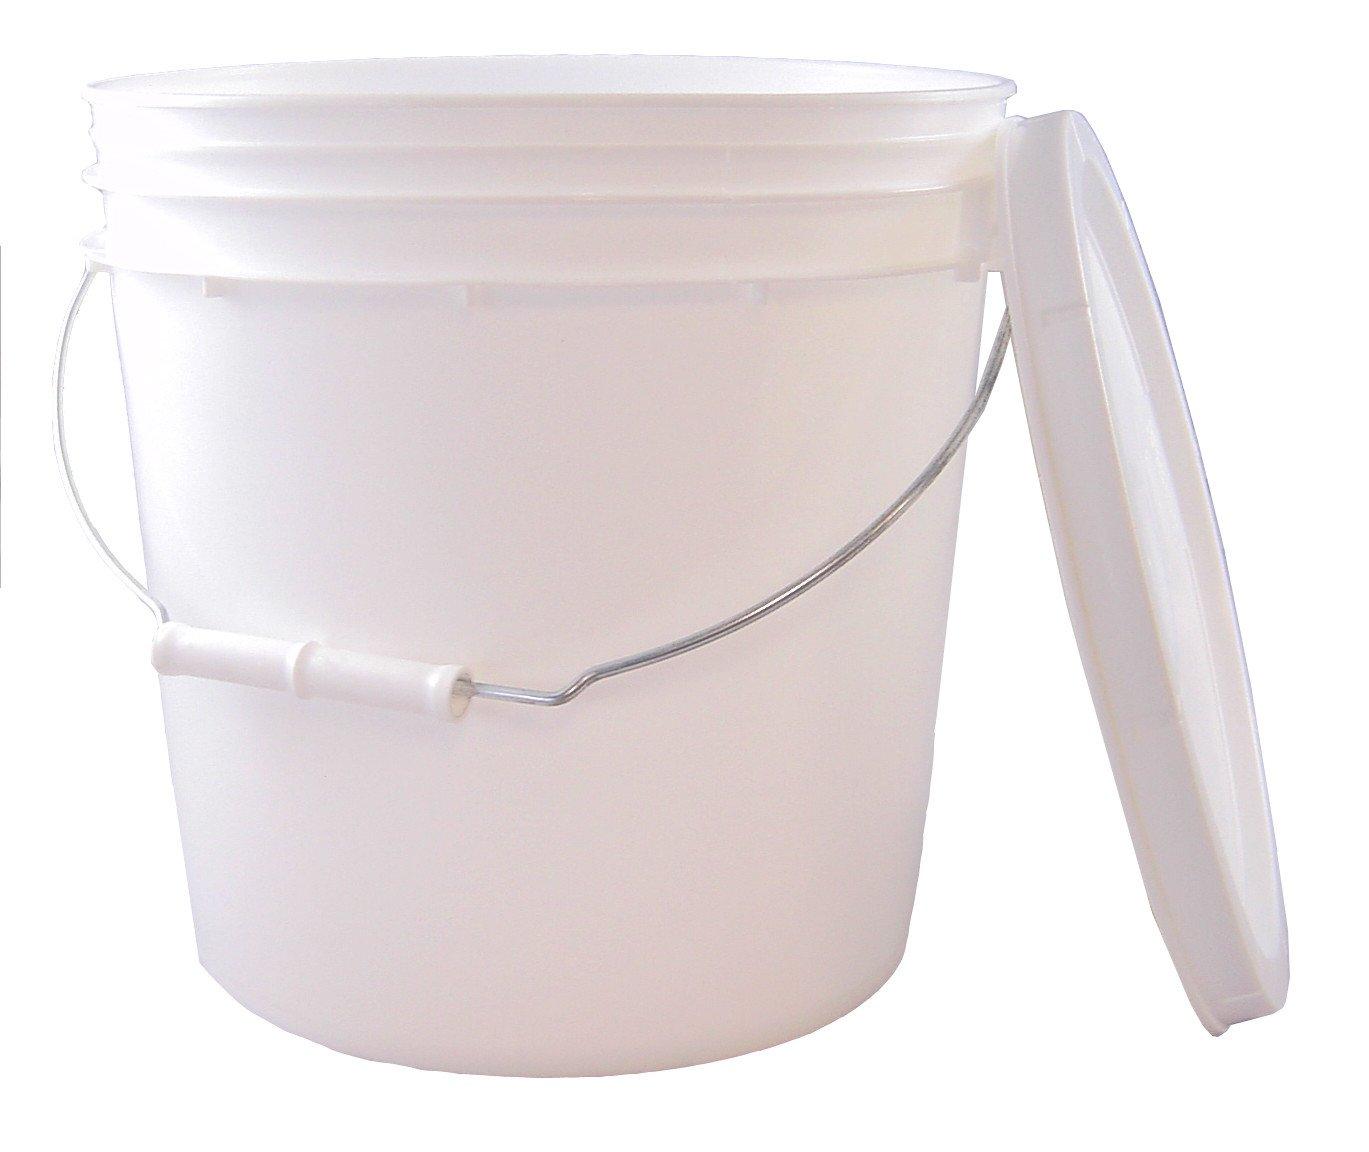 2.0 Gallon Fermenting Bucket